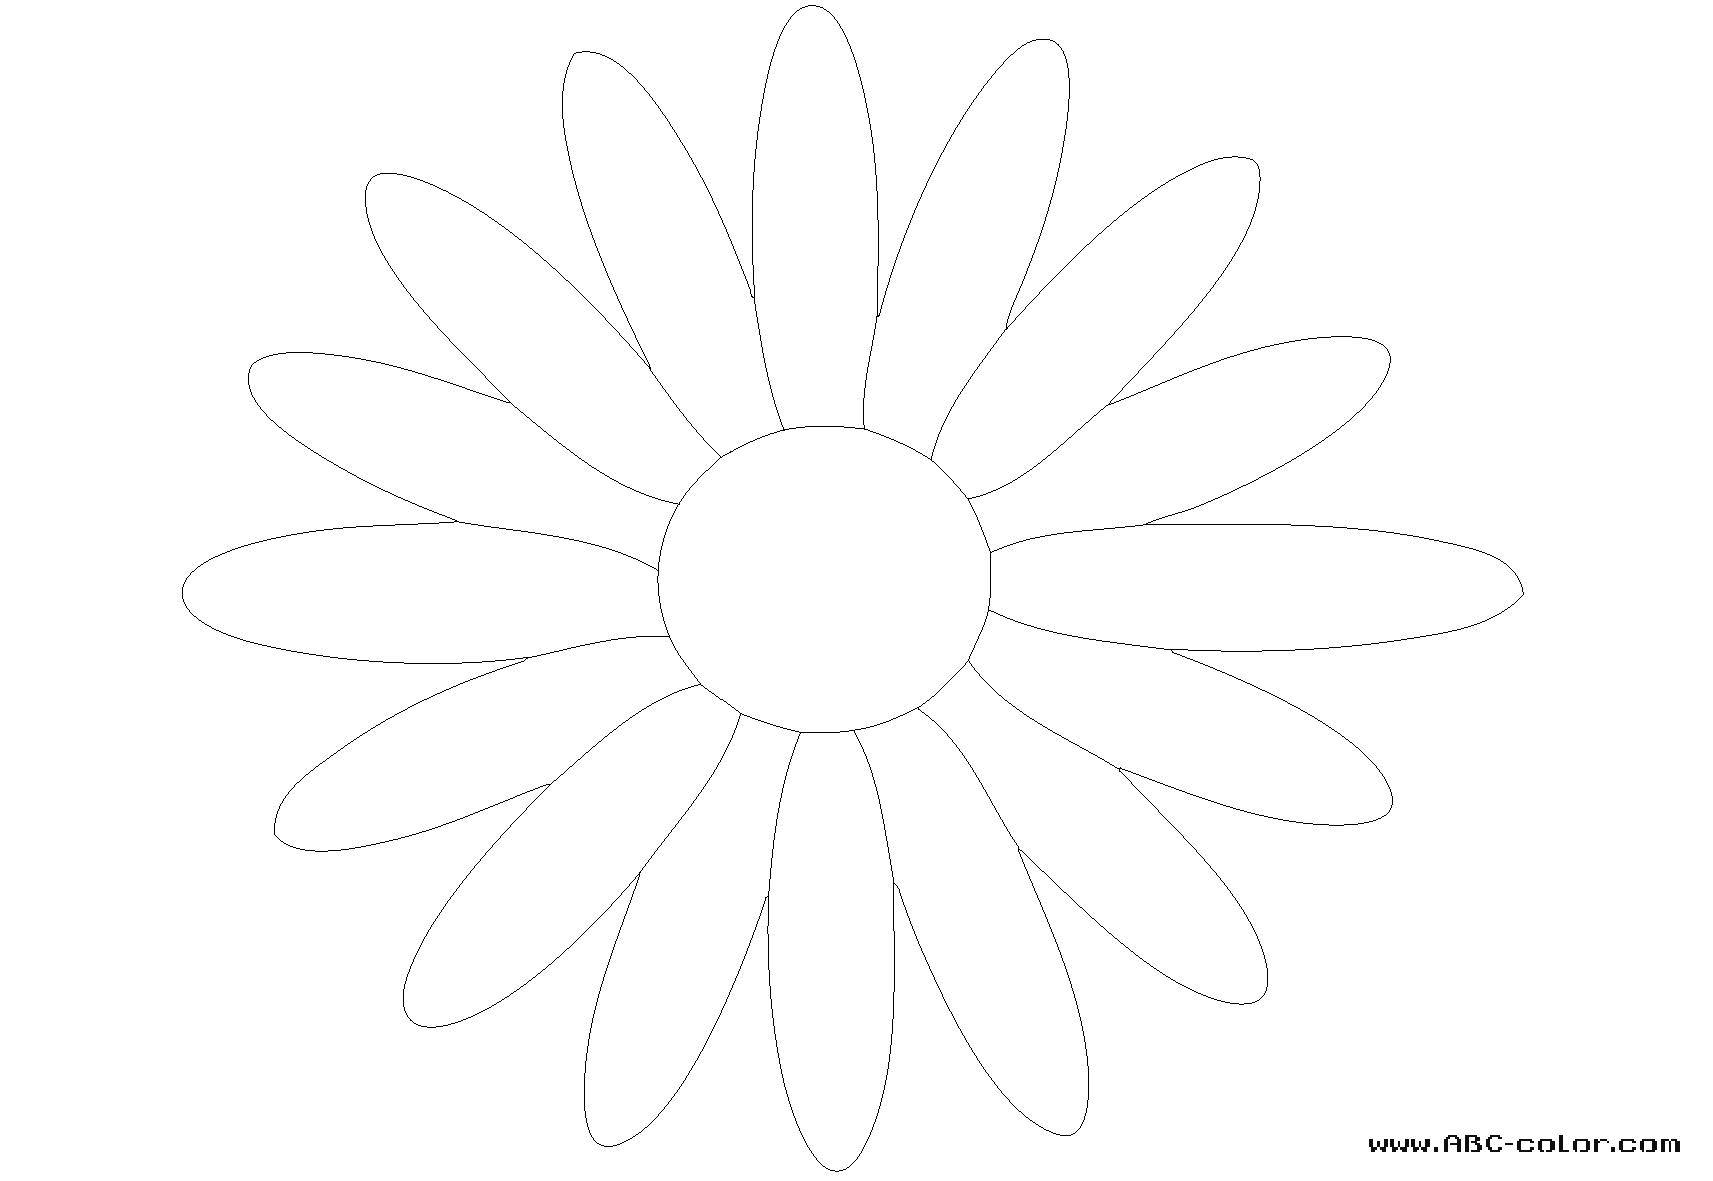 C:\Documents and Settings\Пользователь\Рабочий стол\daisy-wheel-bitmap-coloring.png